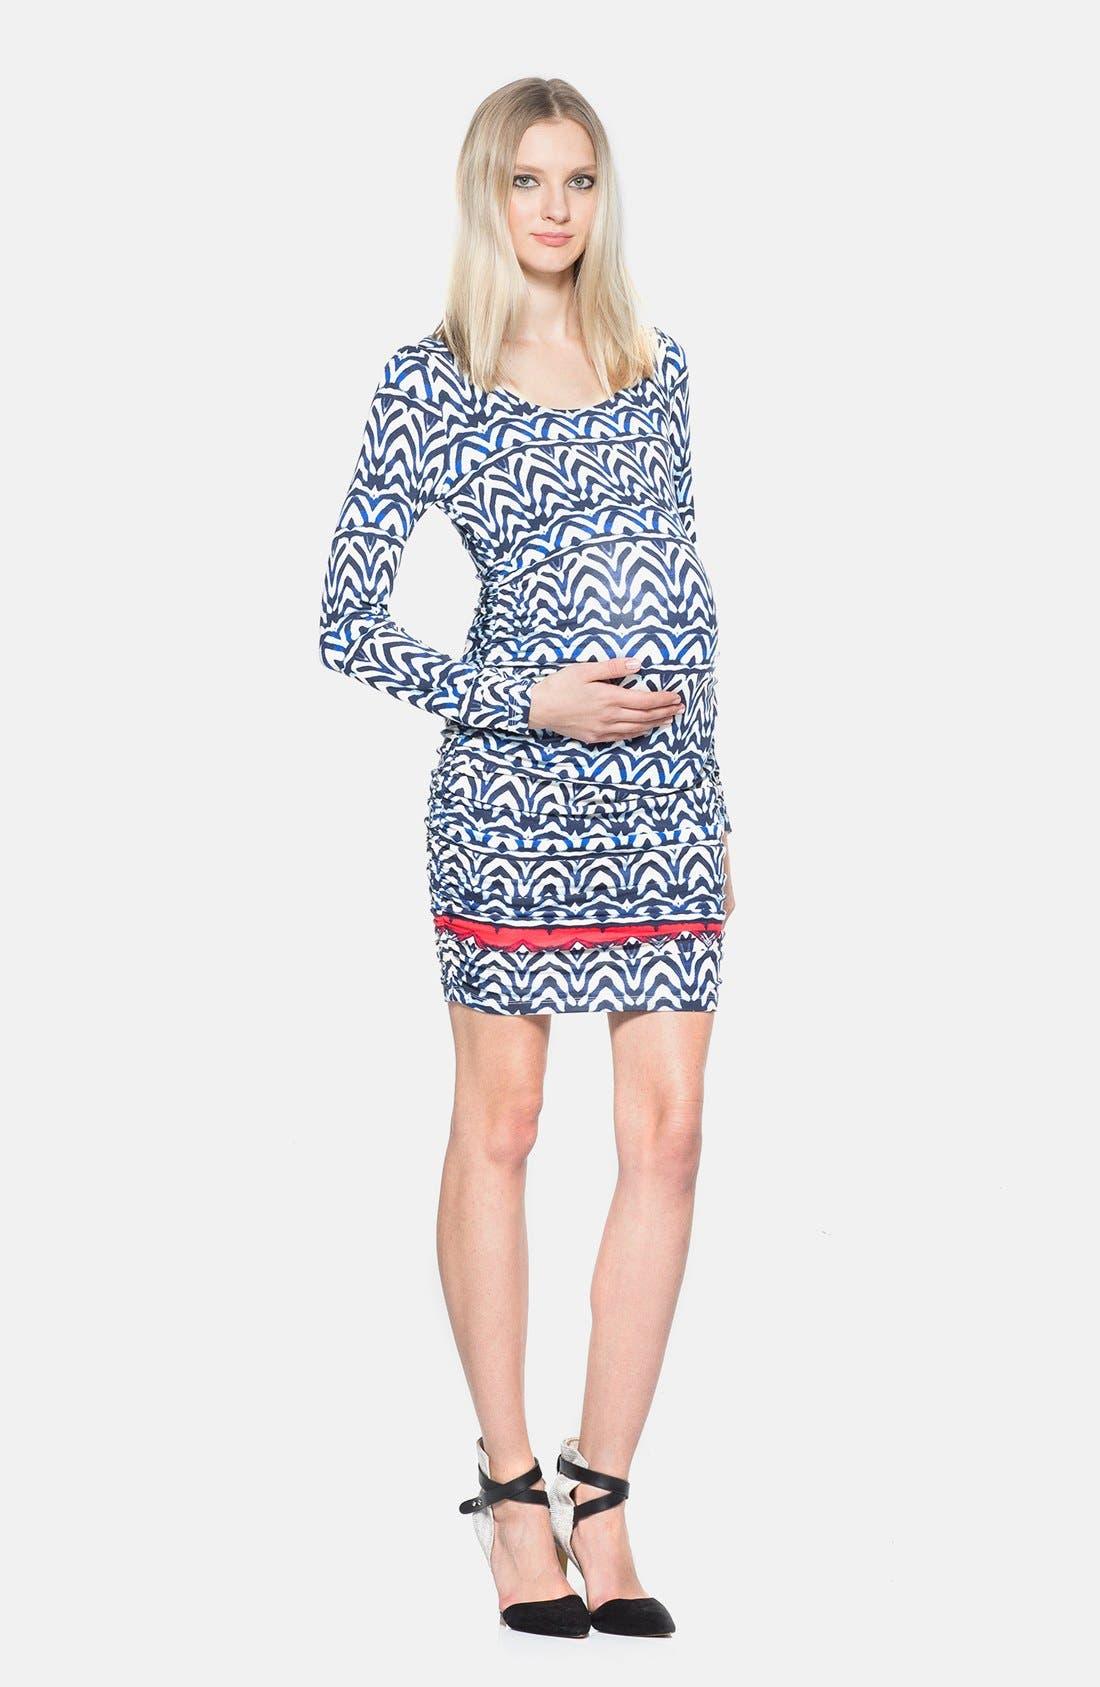 TART MATERNITY 'Shari' Body-Con Maternity Dress, Main, color, 001